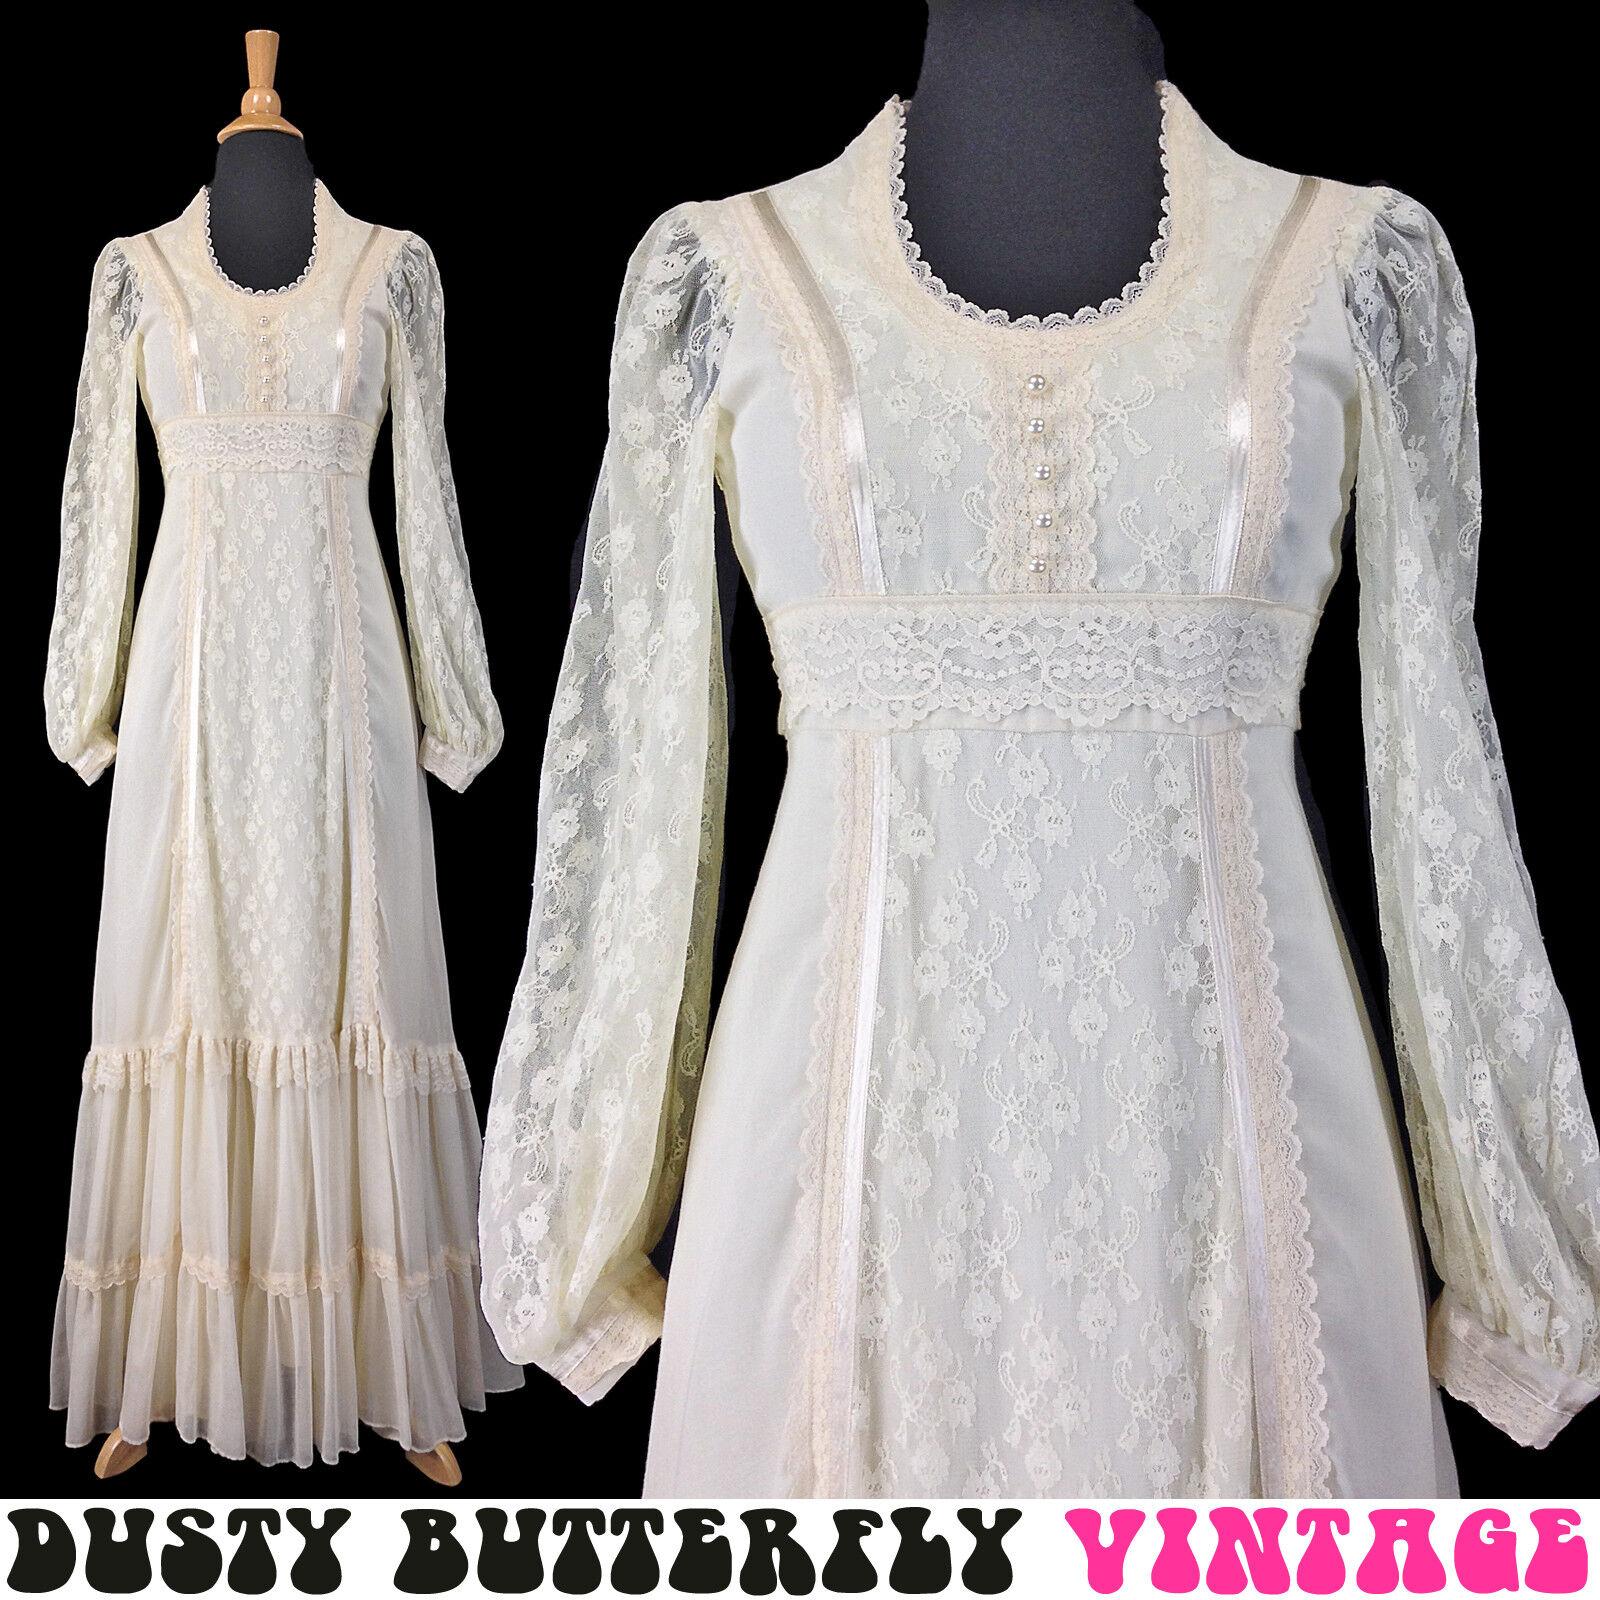 VINTAGE 70s GUNNE SAX BOHO WEDDING DRESS Maxi LACE BISHOP